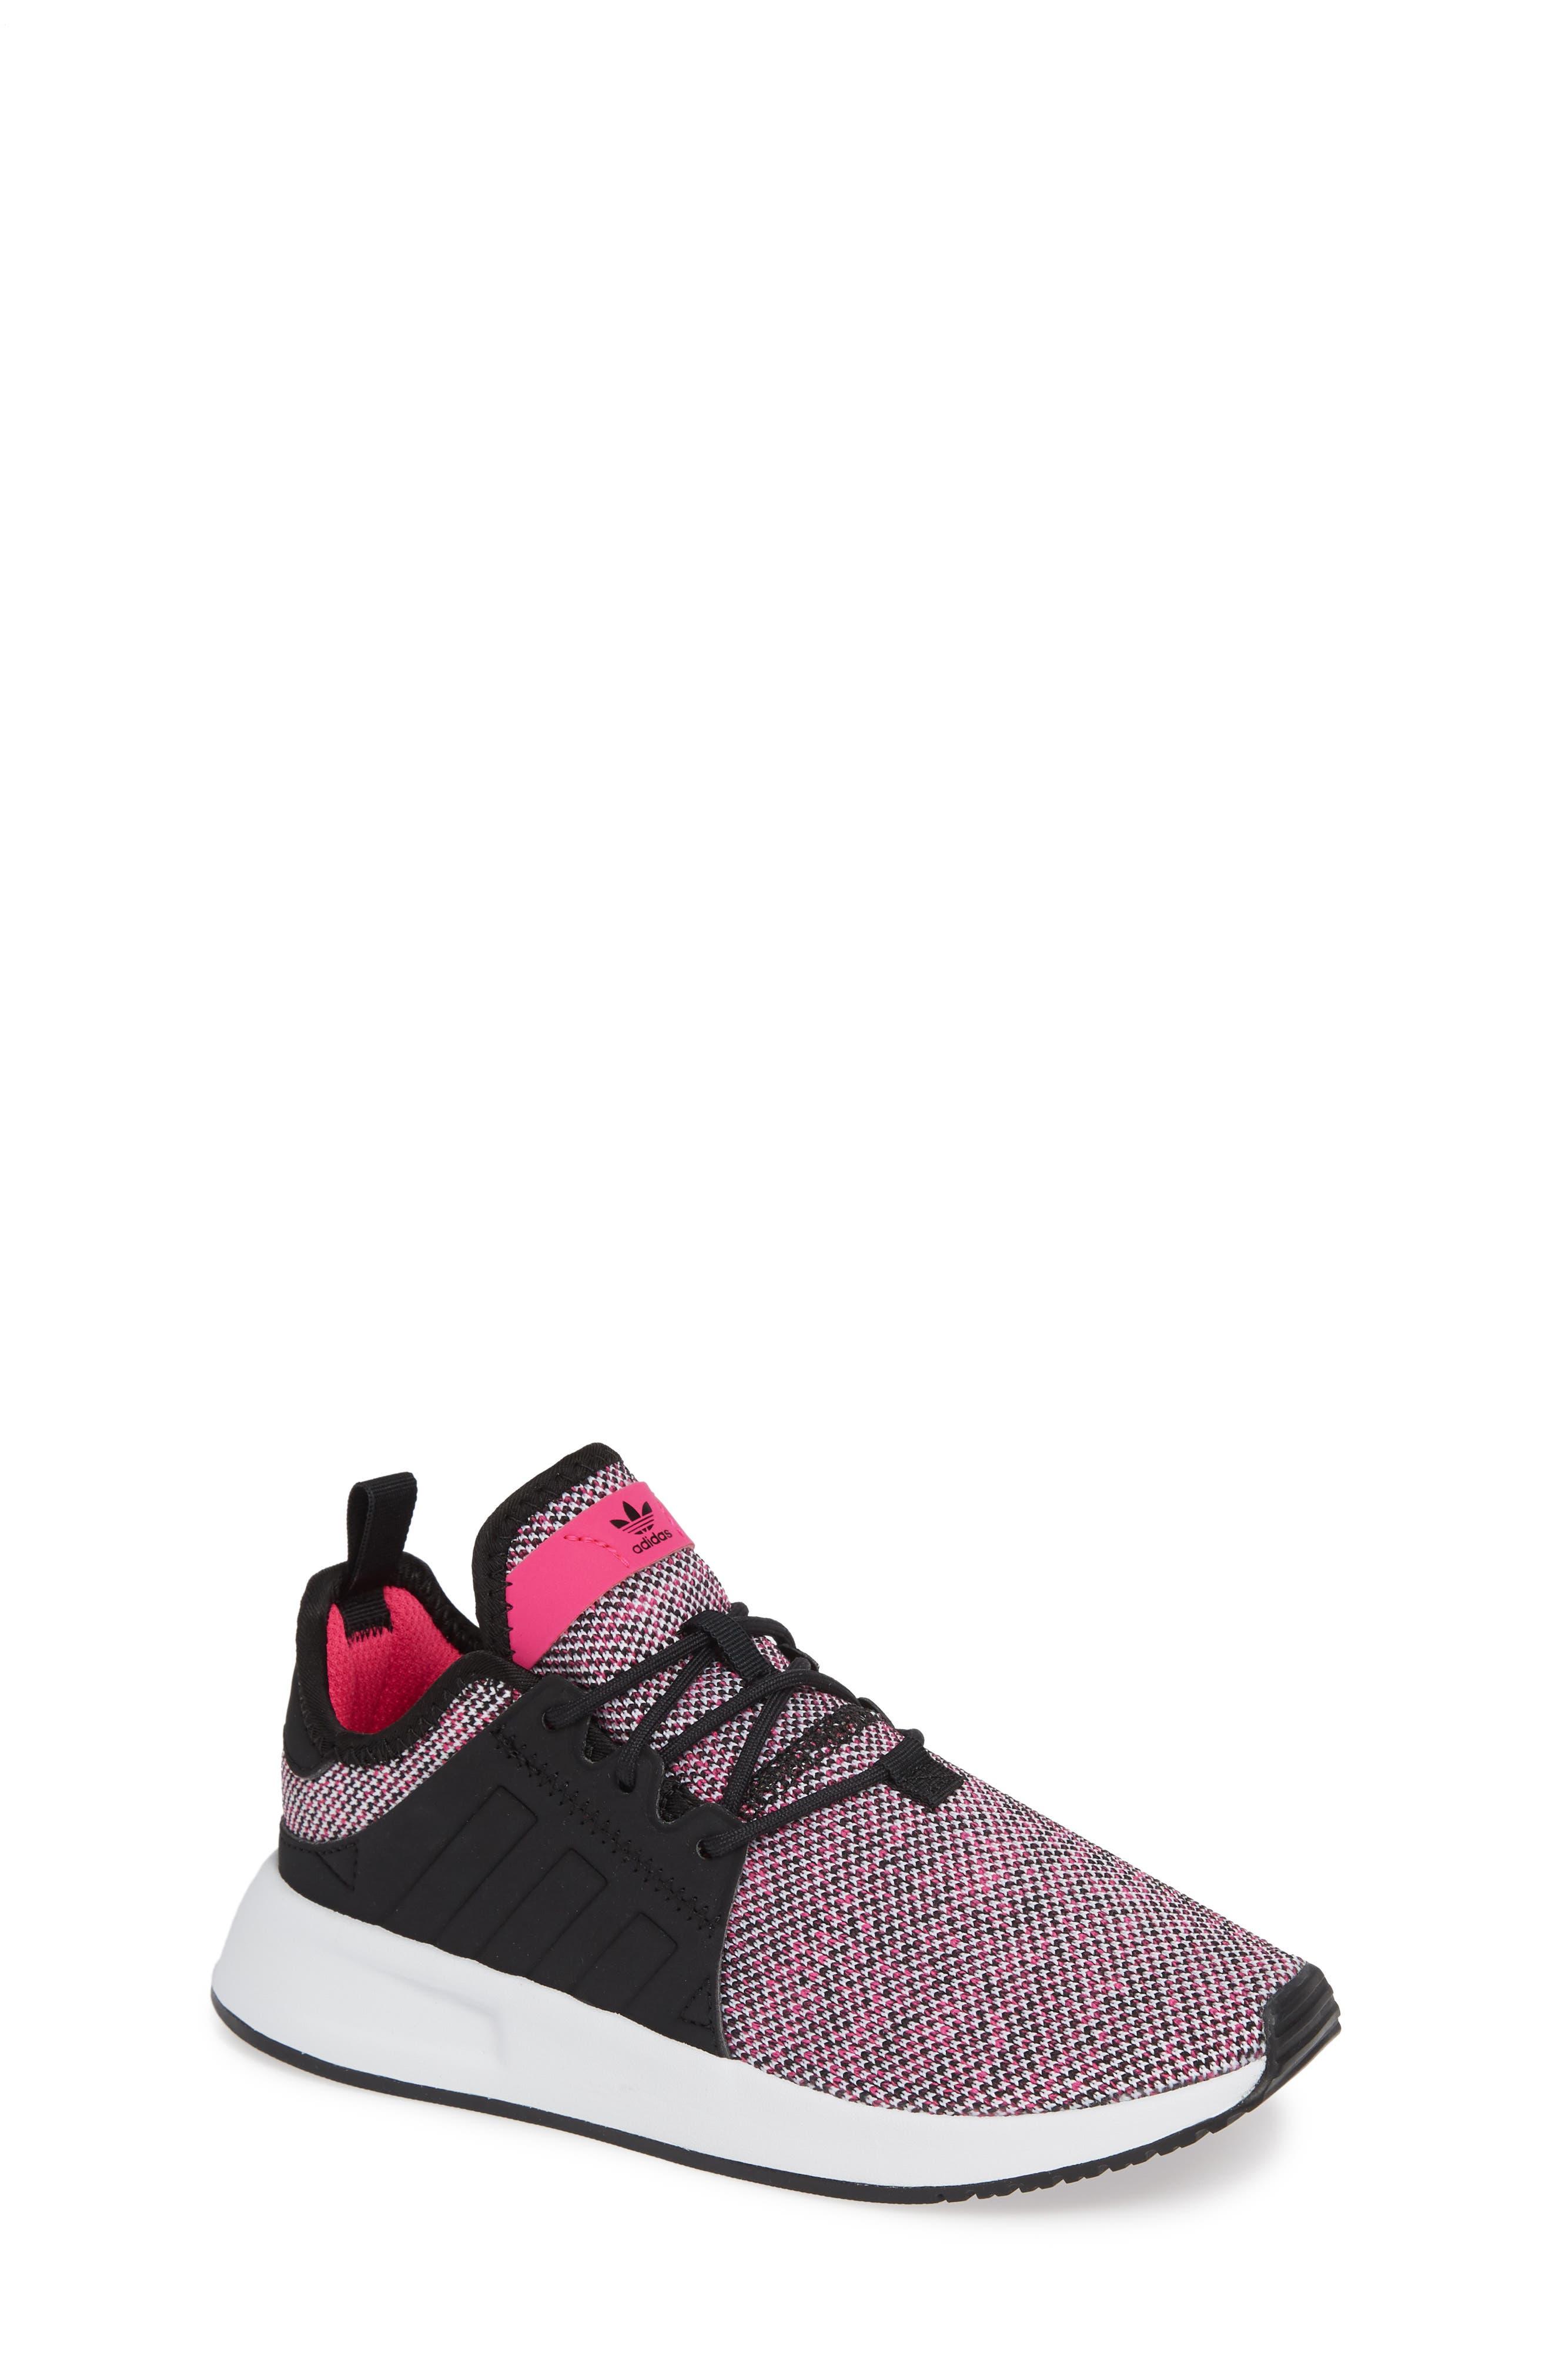 X_PLR Sneaker,                             Main thumbnail 1, color,                             Shock Pink/ Black/ White